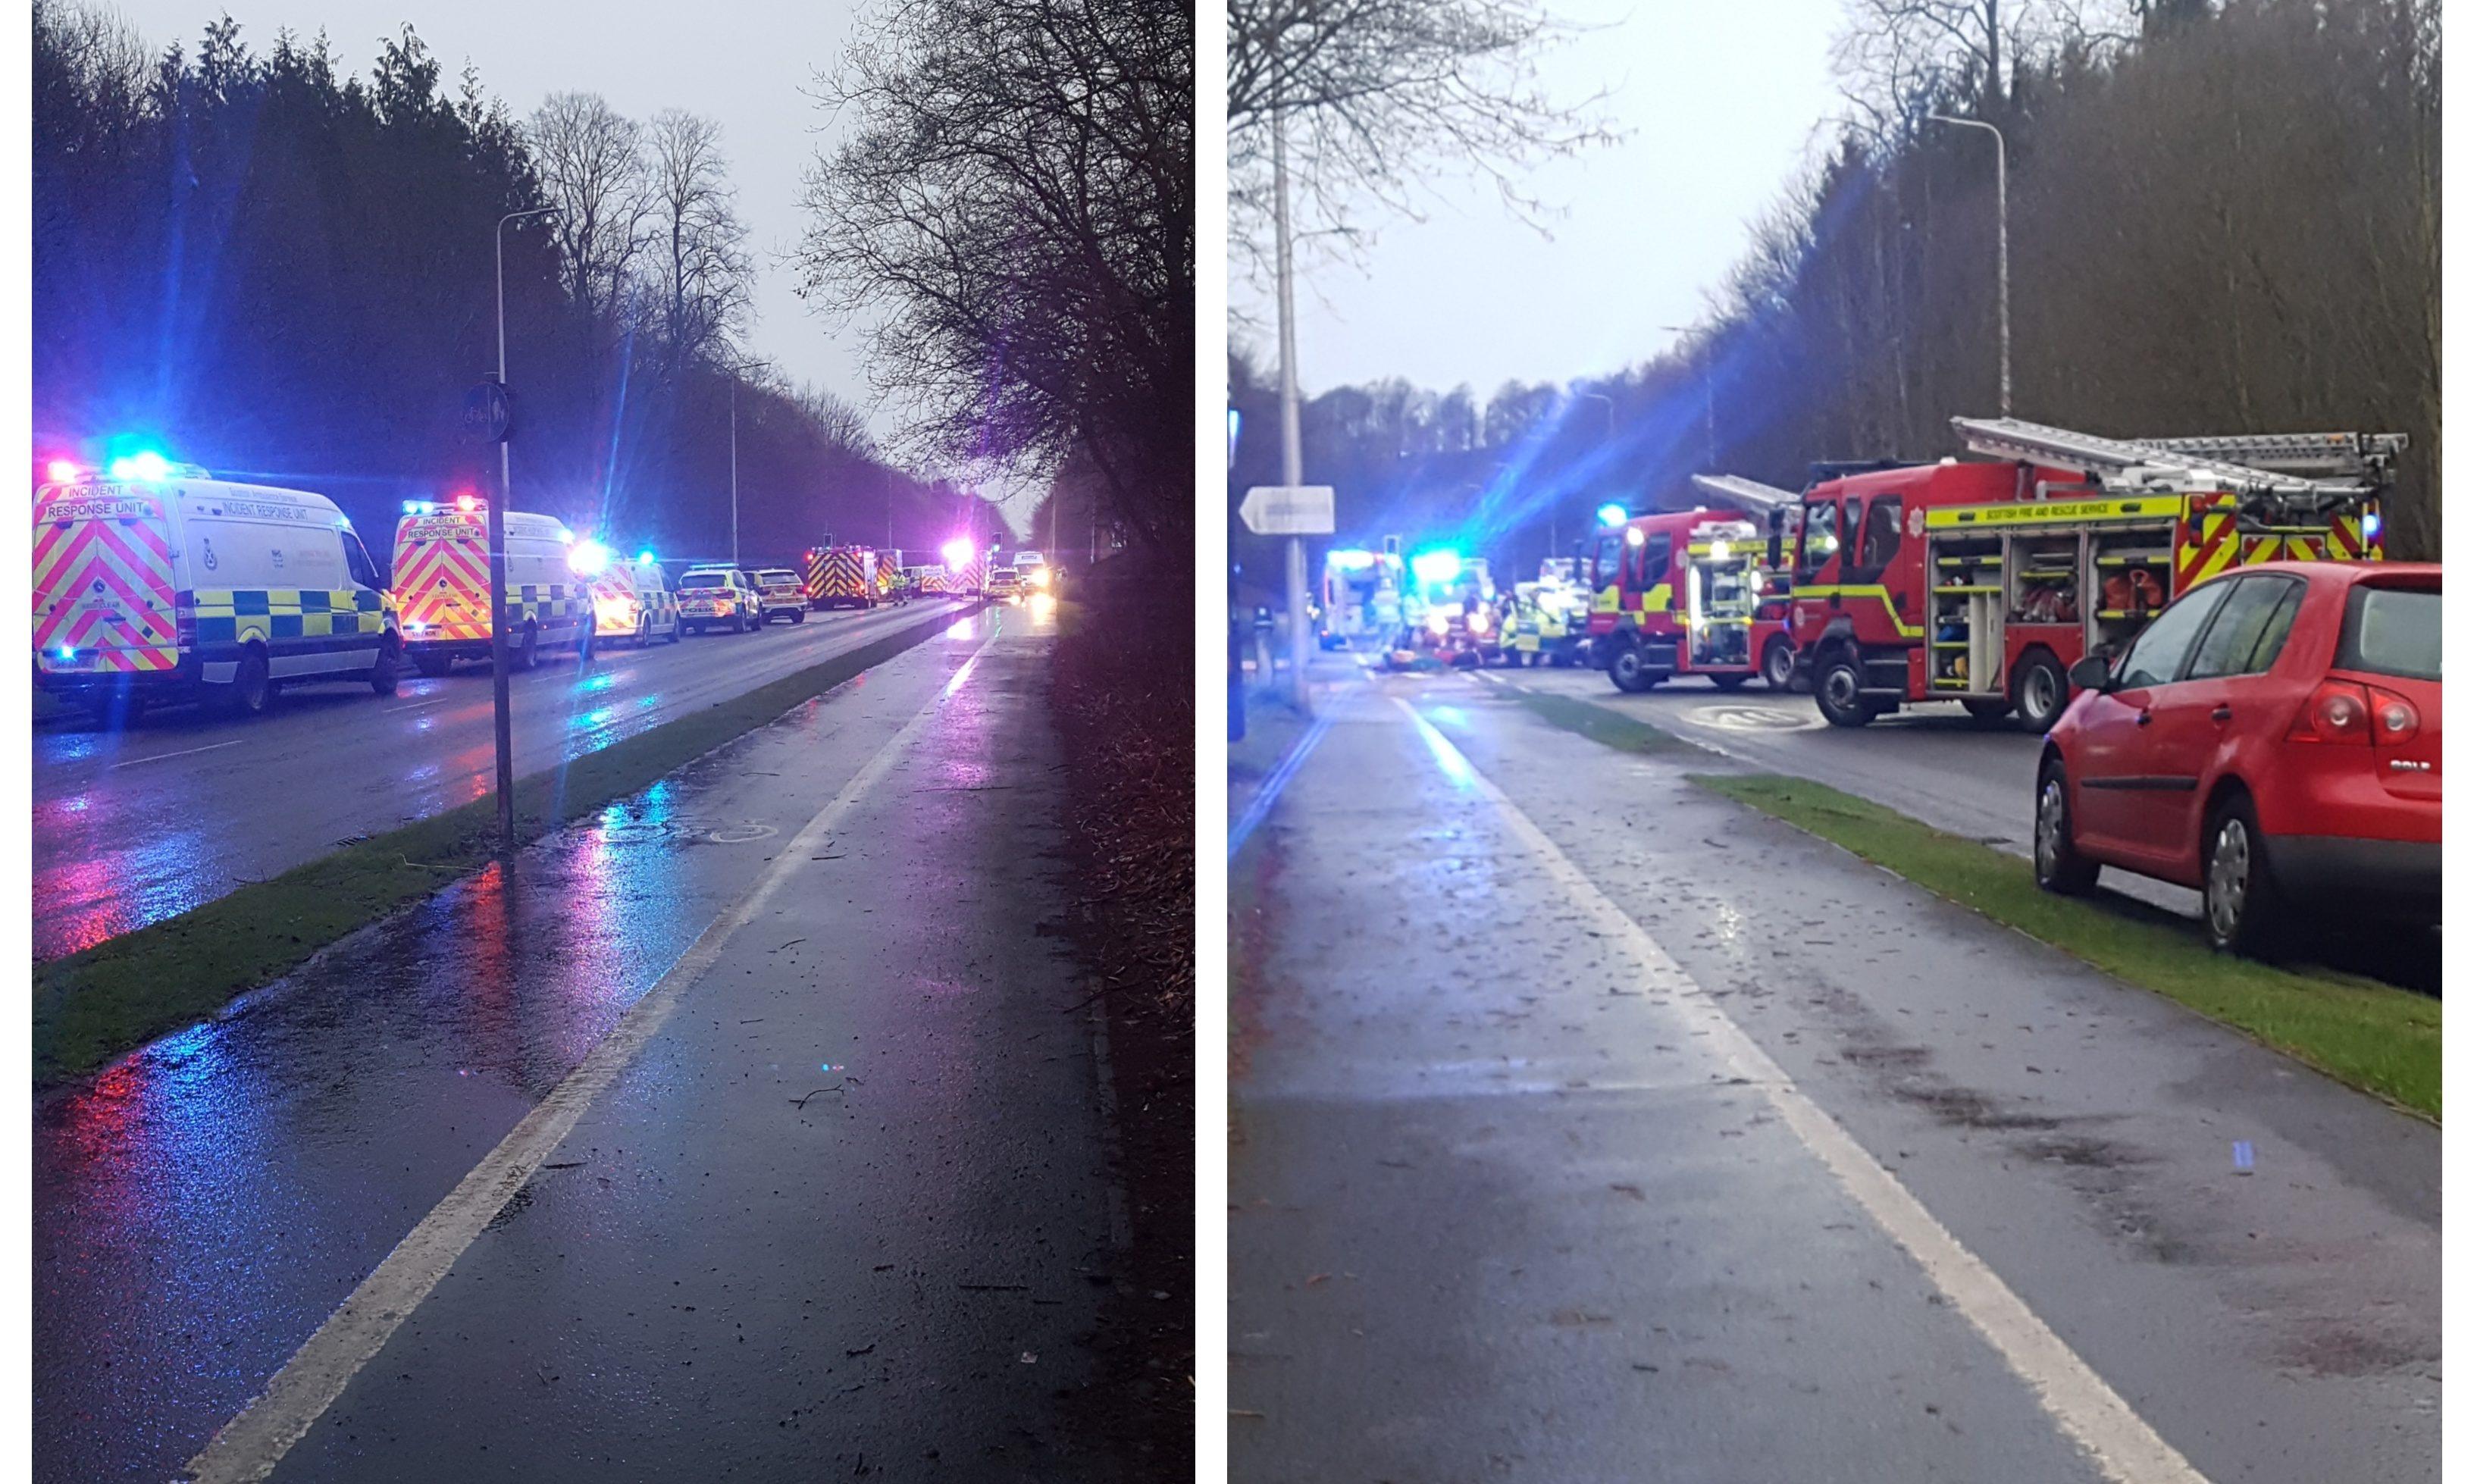 The scene of the crash in Kirkcaldy.